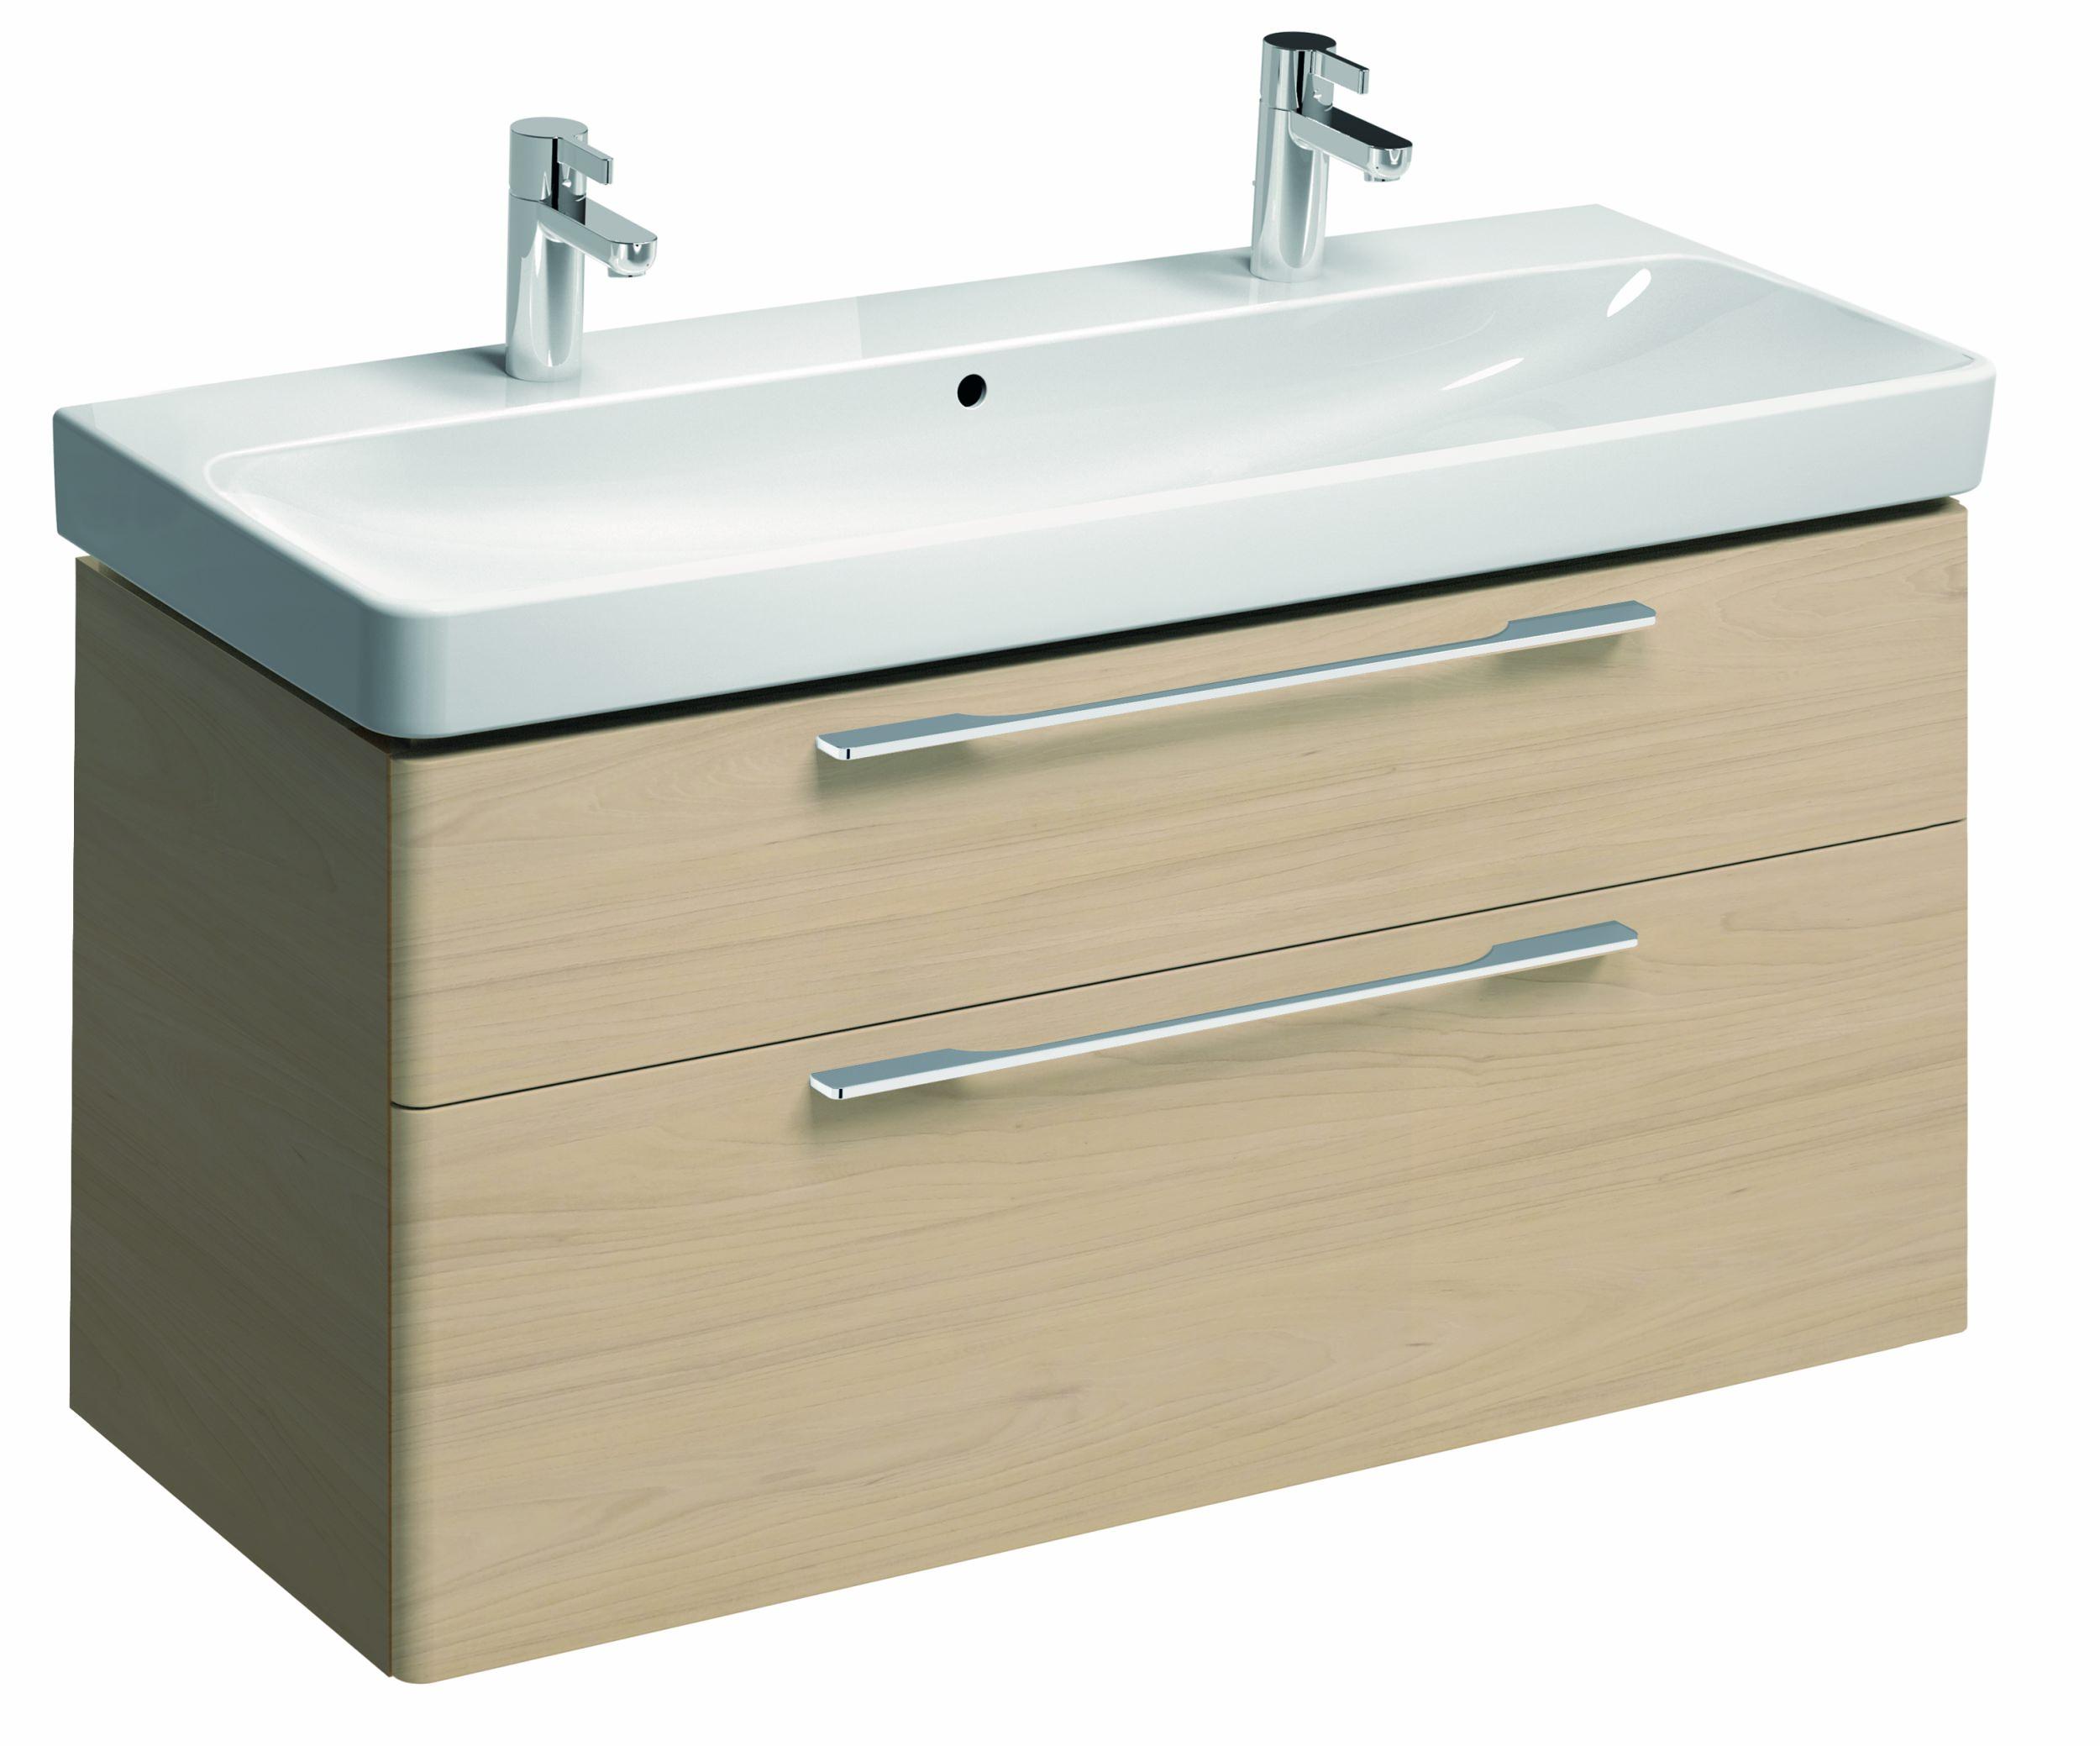 keramag smyle waschtischunterschrank 1168x625x461mm ulme hell 805123000. Black Bedroom Furniture Sets. Home Design Ideas